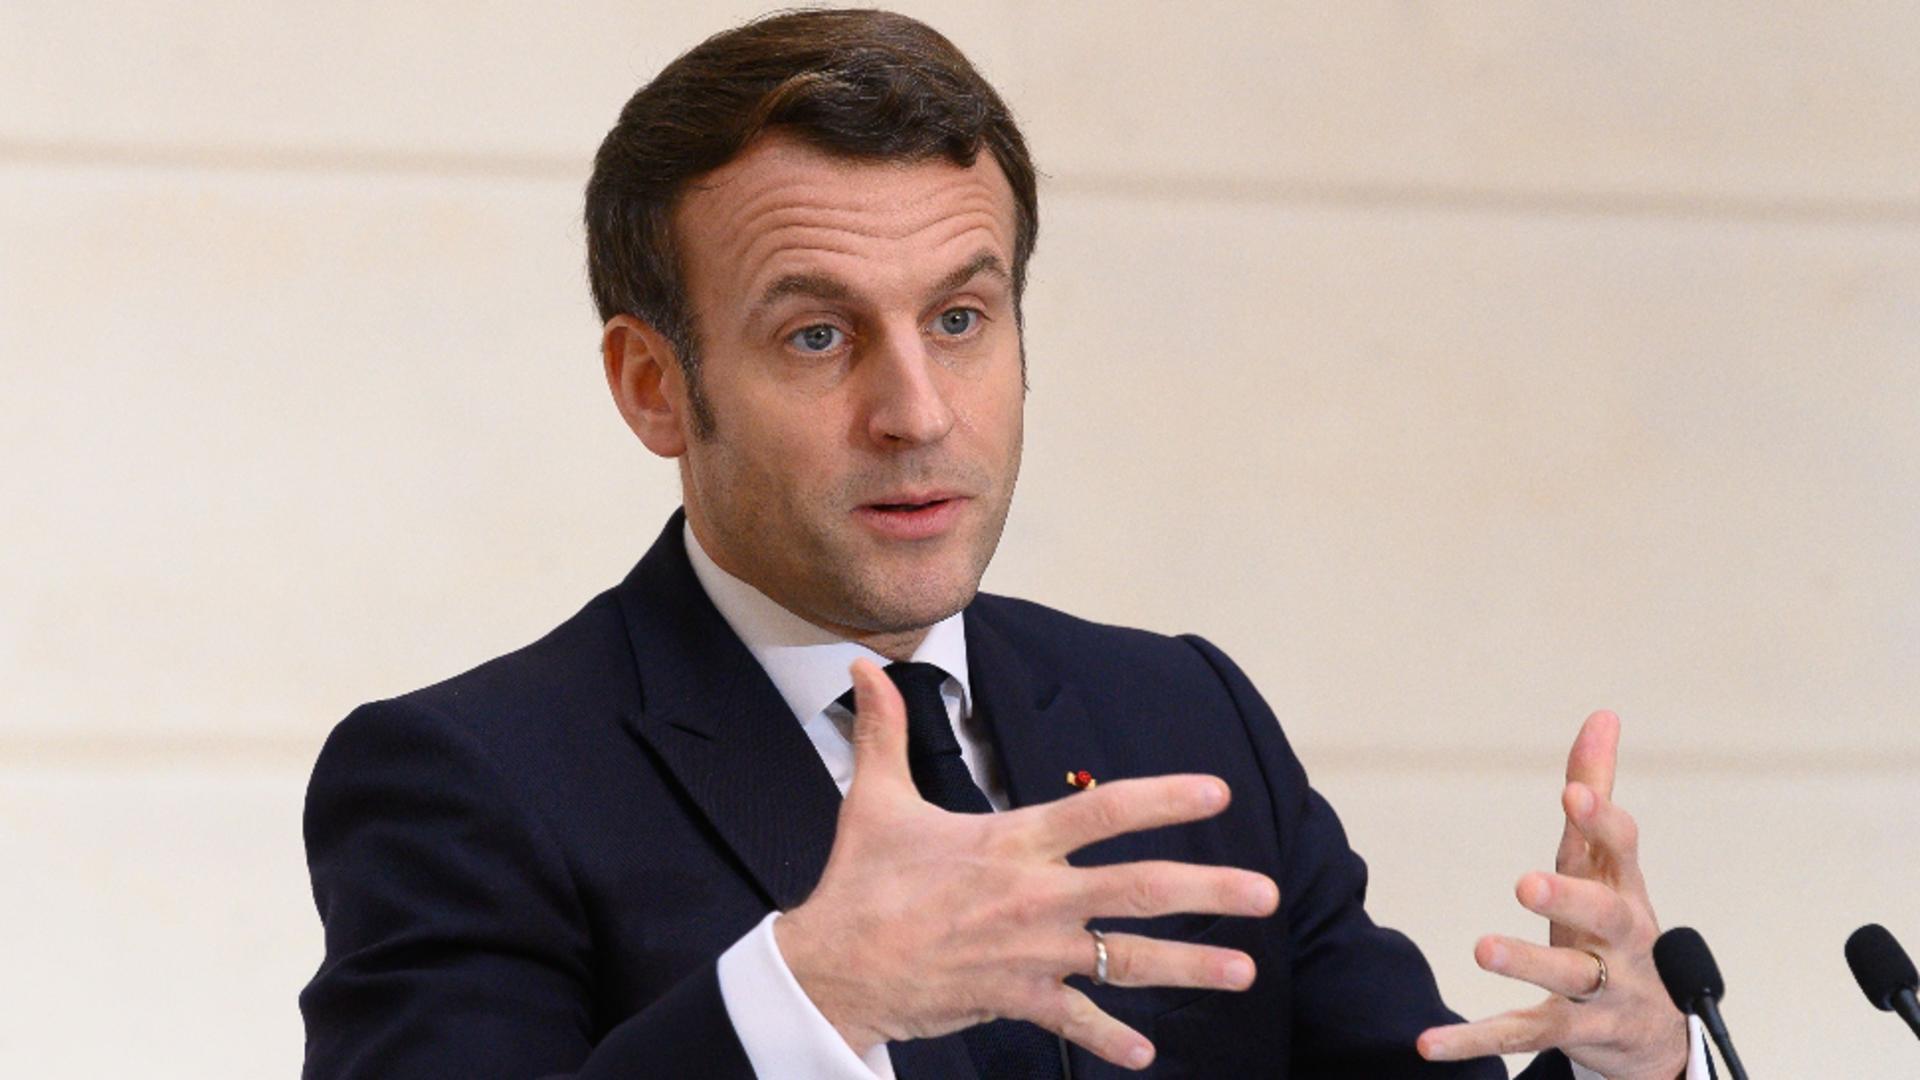 Emmanuel Macron, președintele Franței / Foto: Profimedia